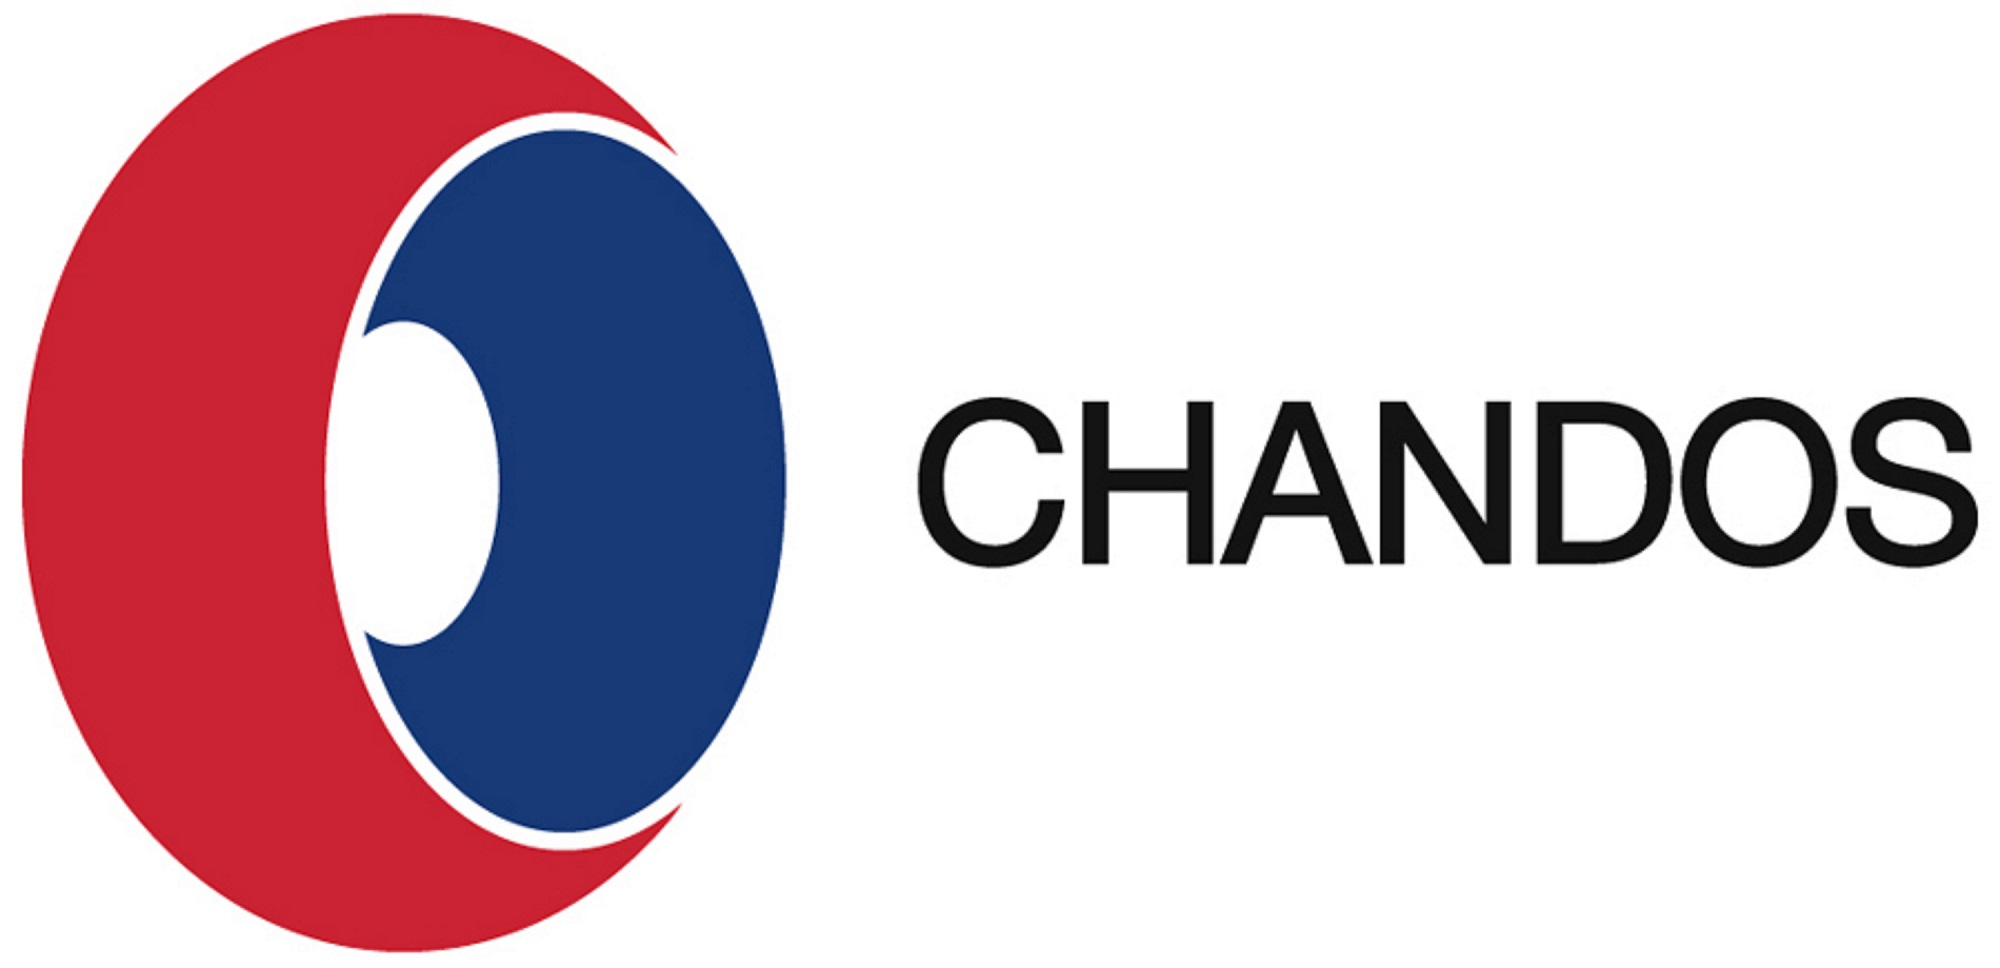 chandos_construction_company_logo_2019.docx